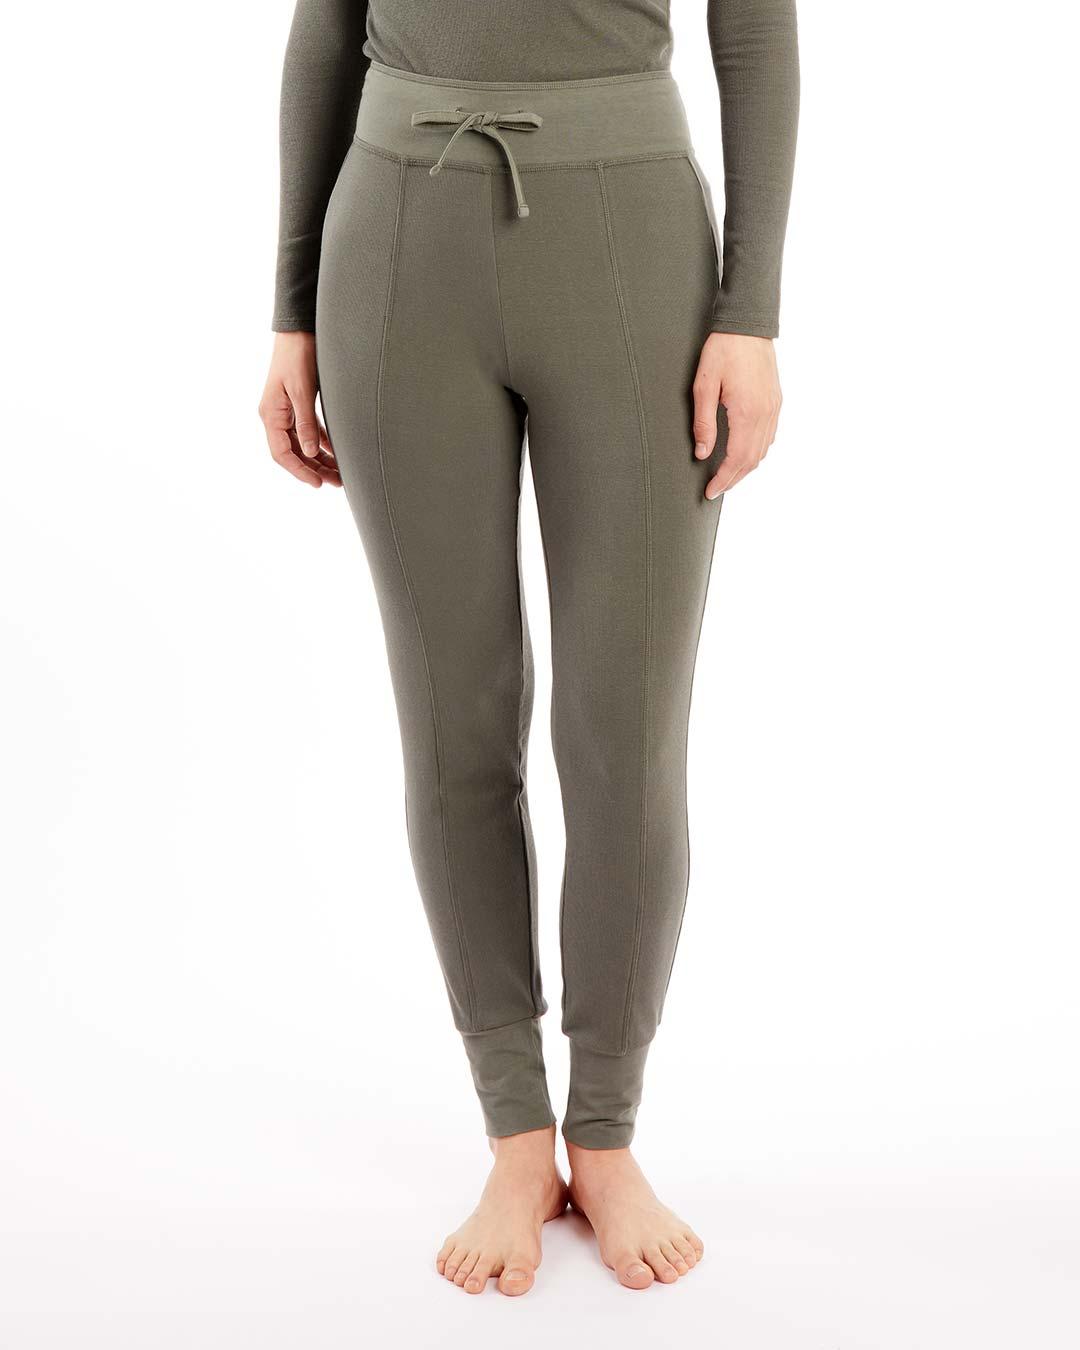 paper-label-danika-jogger-ash-green-front-dianes-lingerie-vancouver-1080x1350